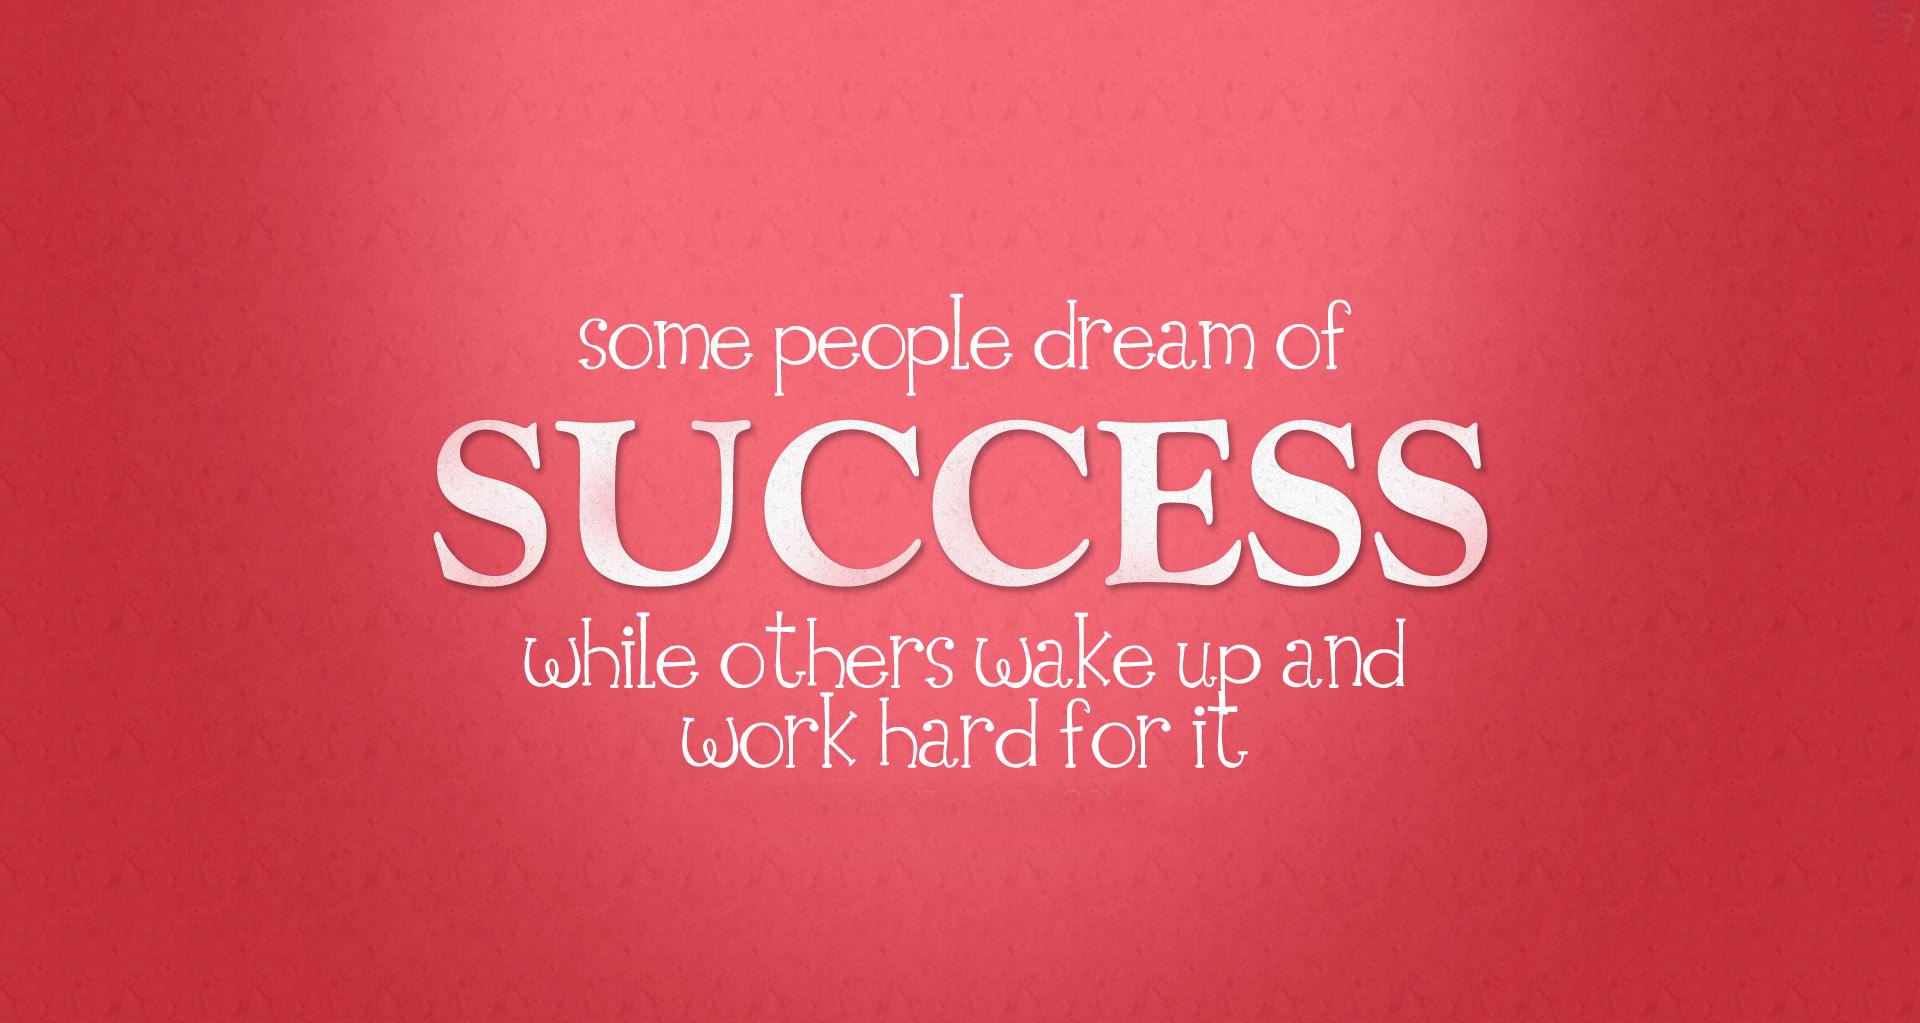 success-motivational-quotes-photo-2014-best.jpg